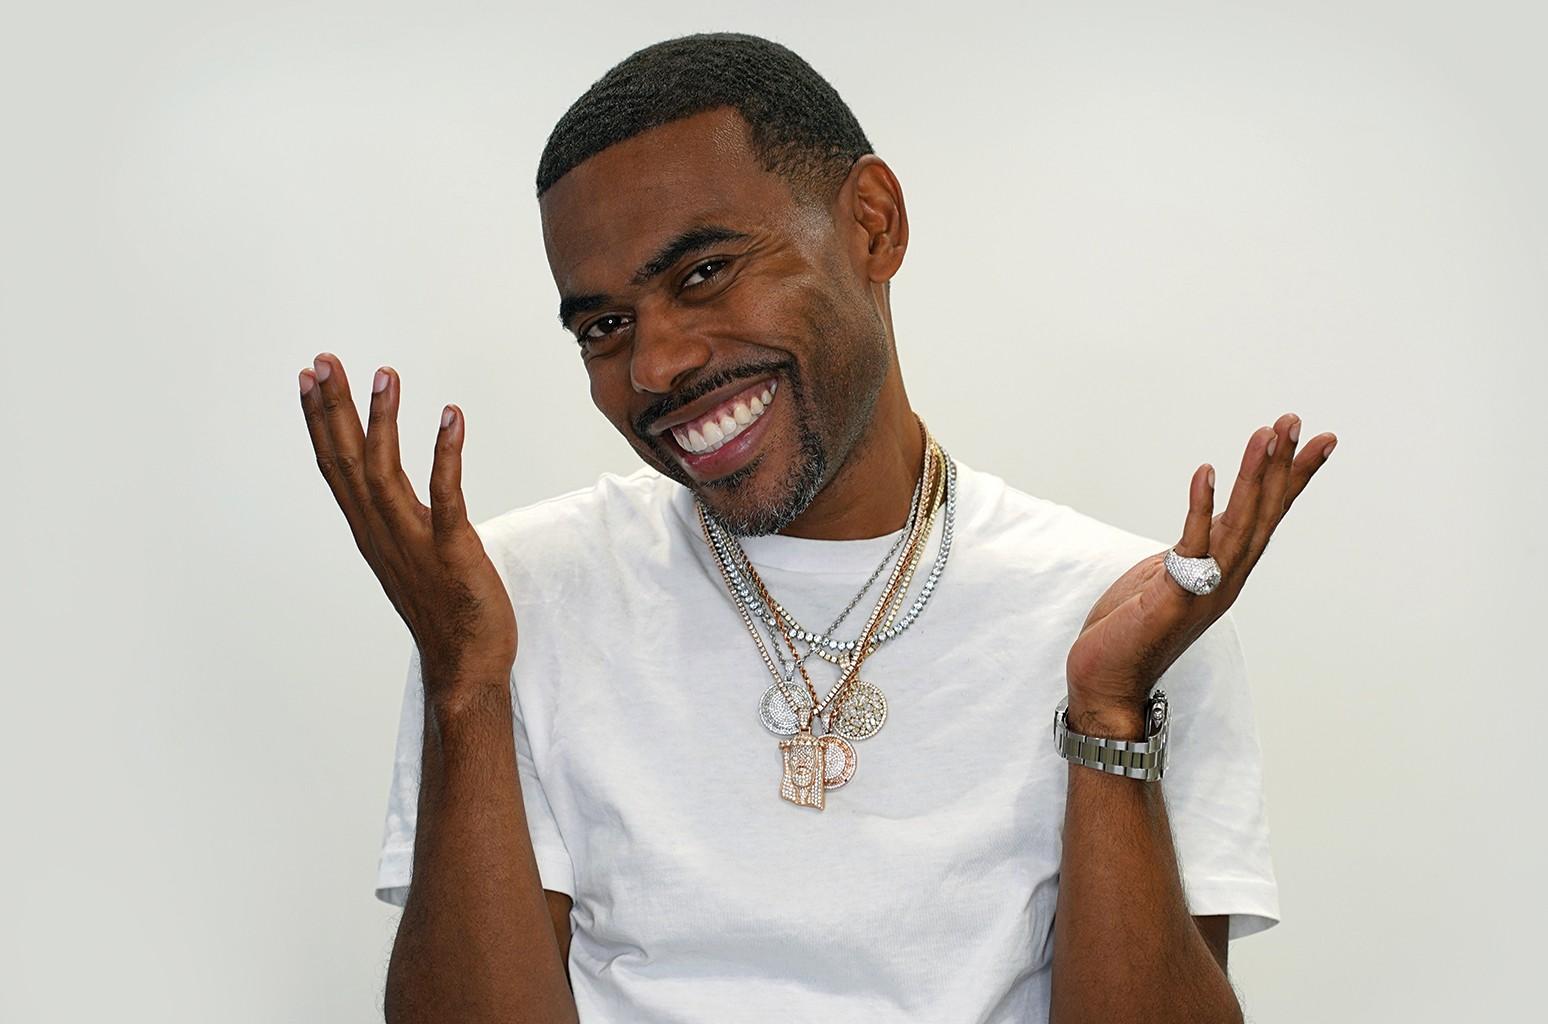 Lil Duval on the Success of 'Smile' | Billboard | Billboard